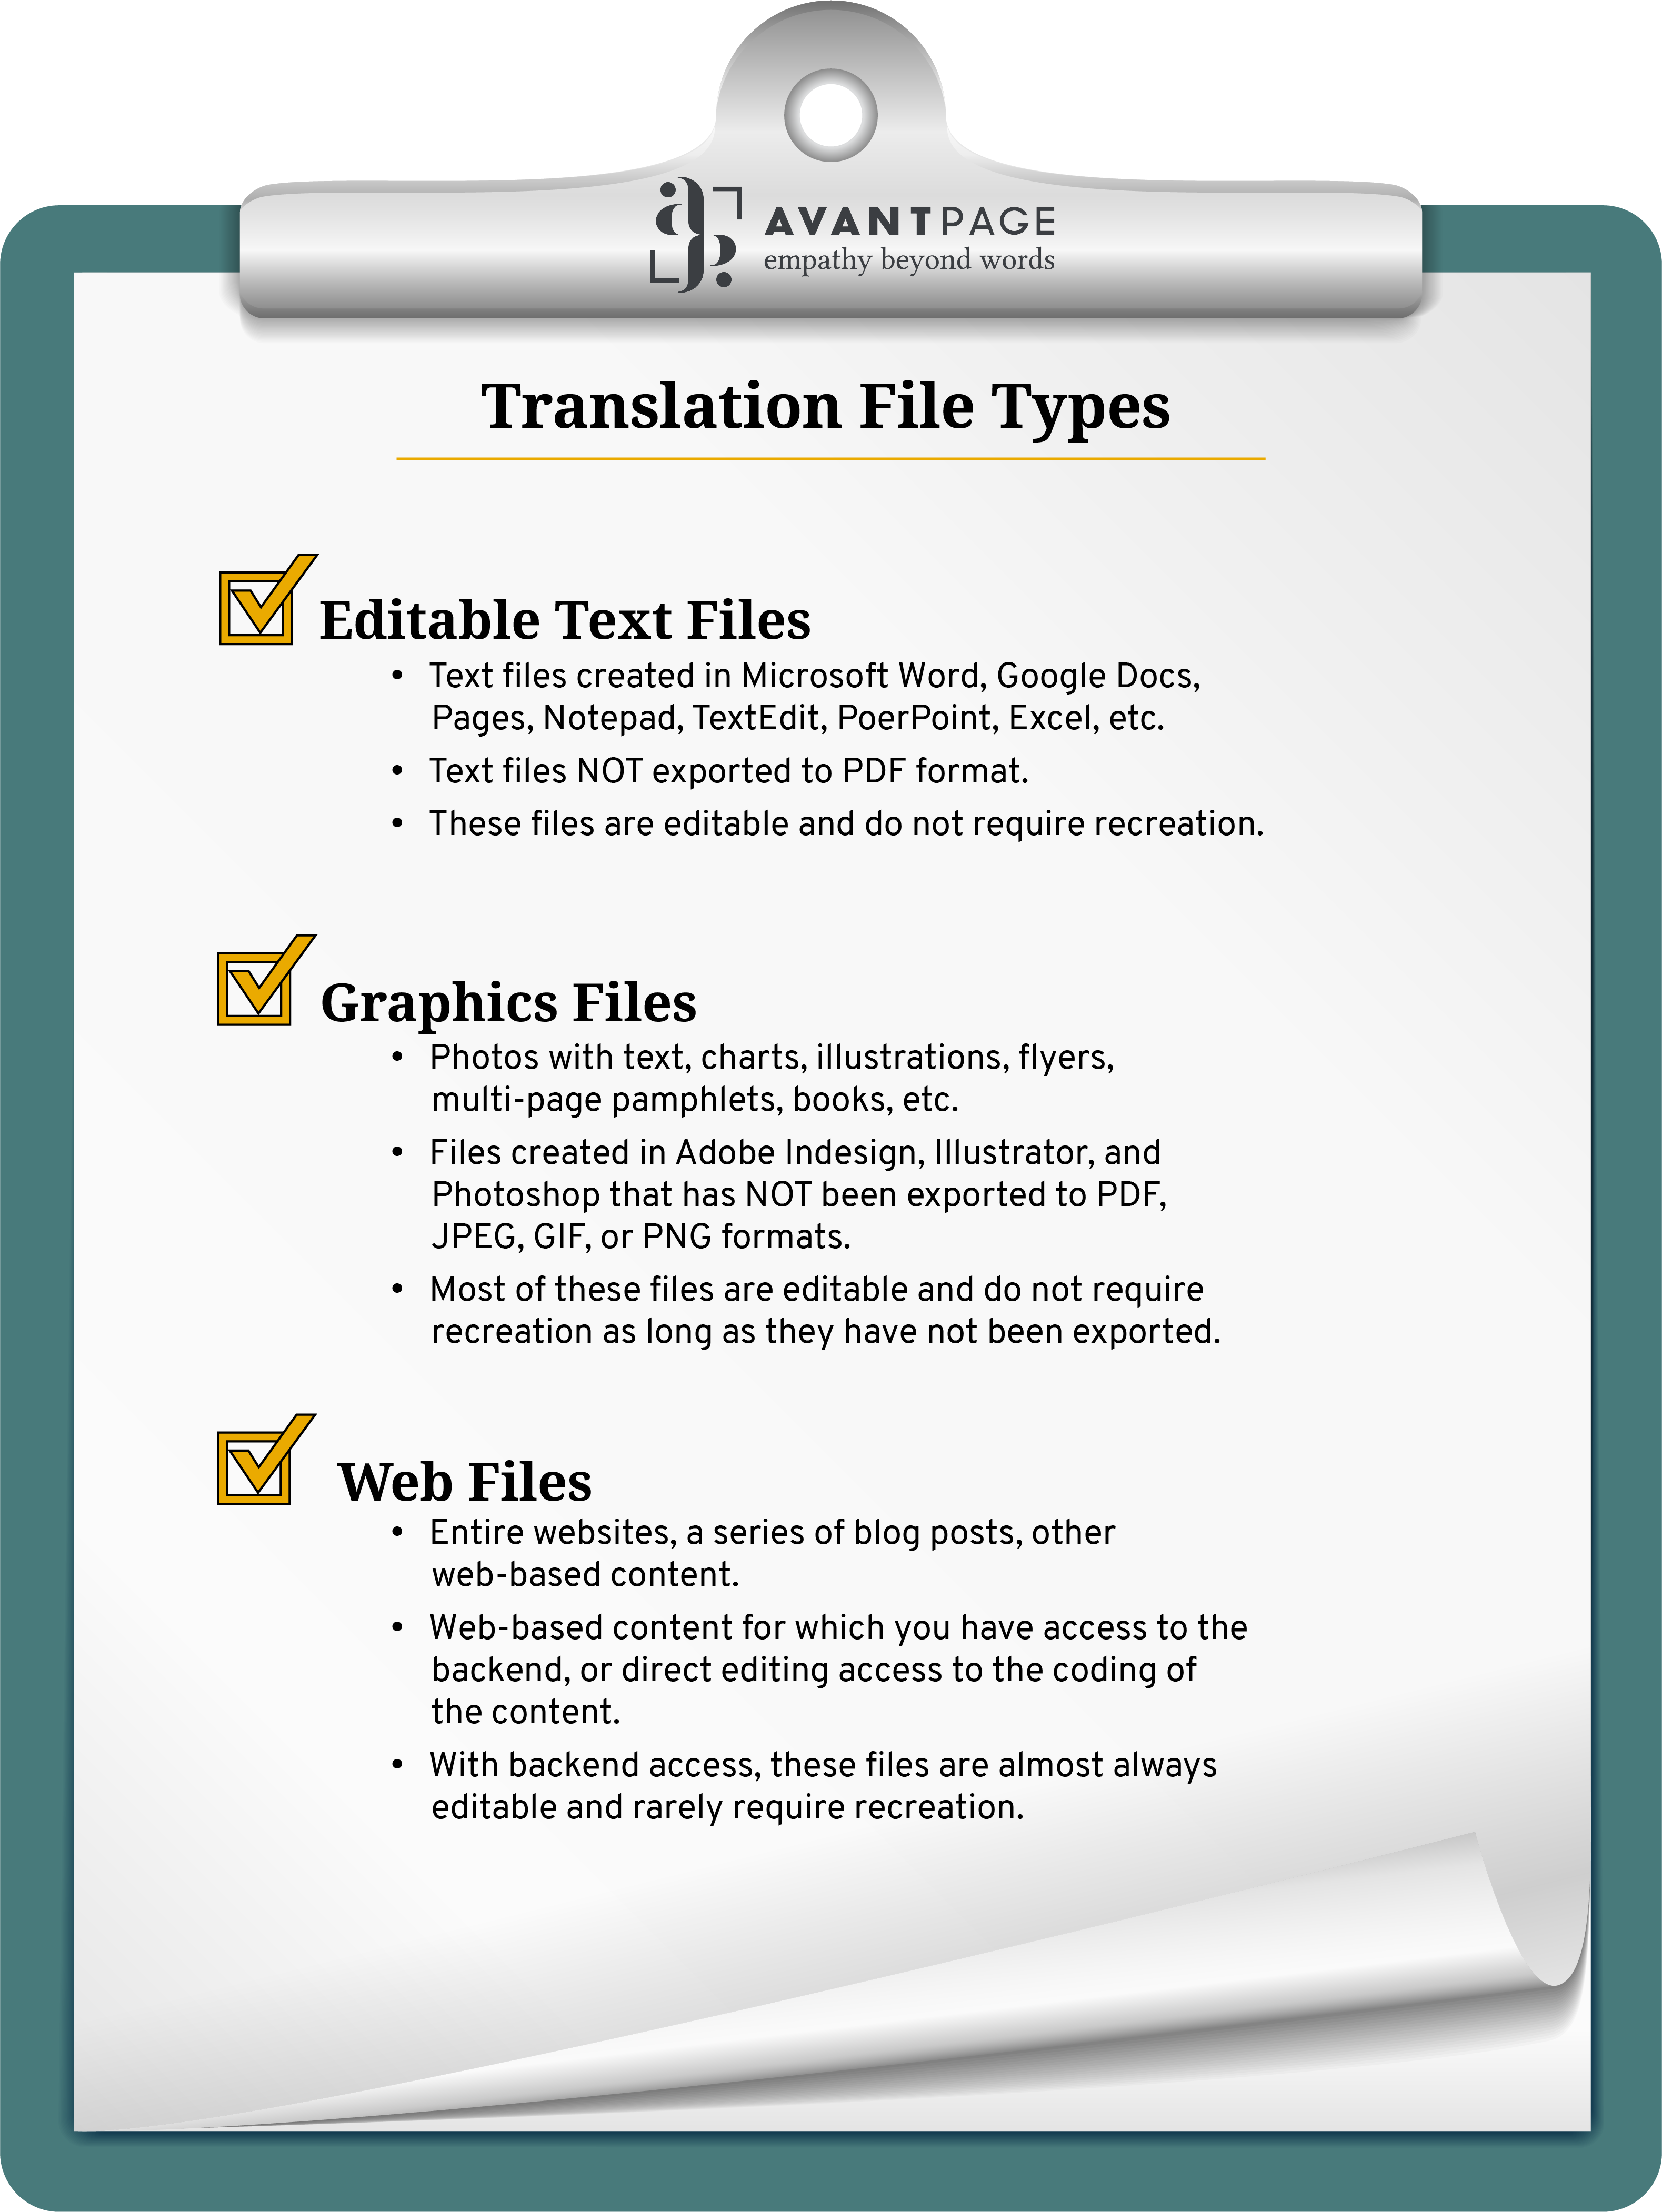 Translation File Types Checklist